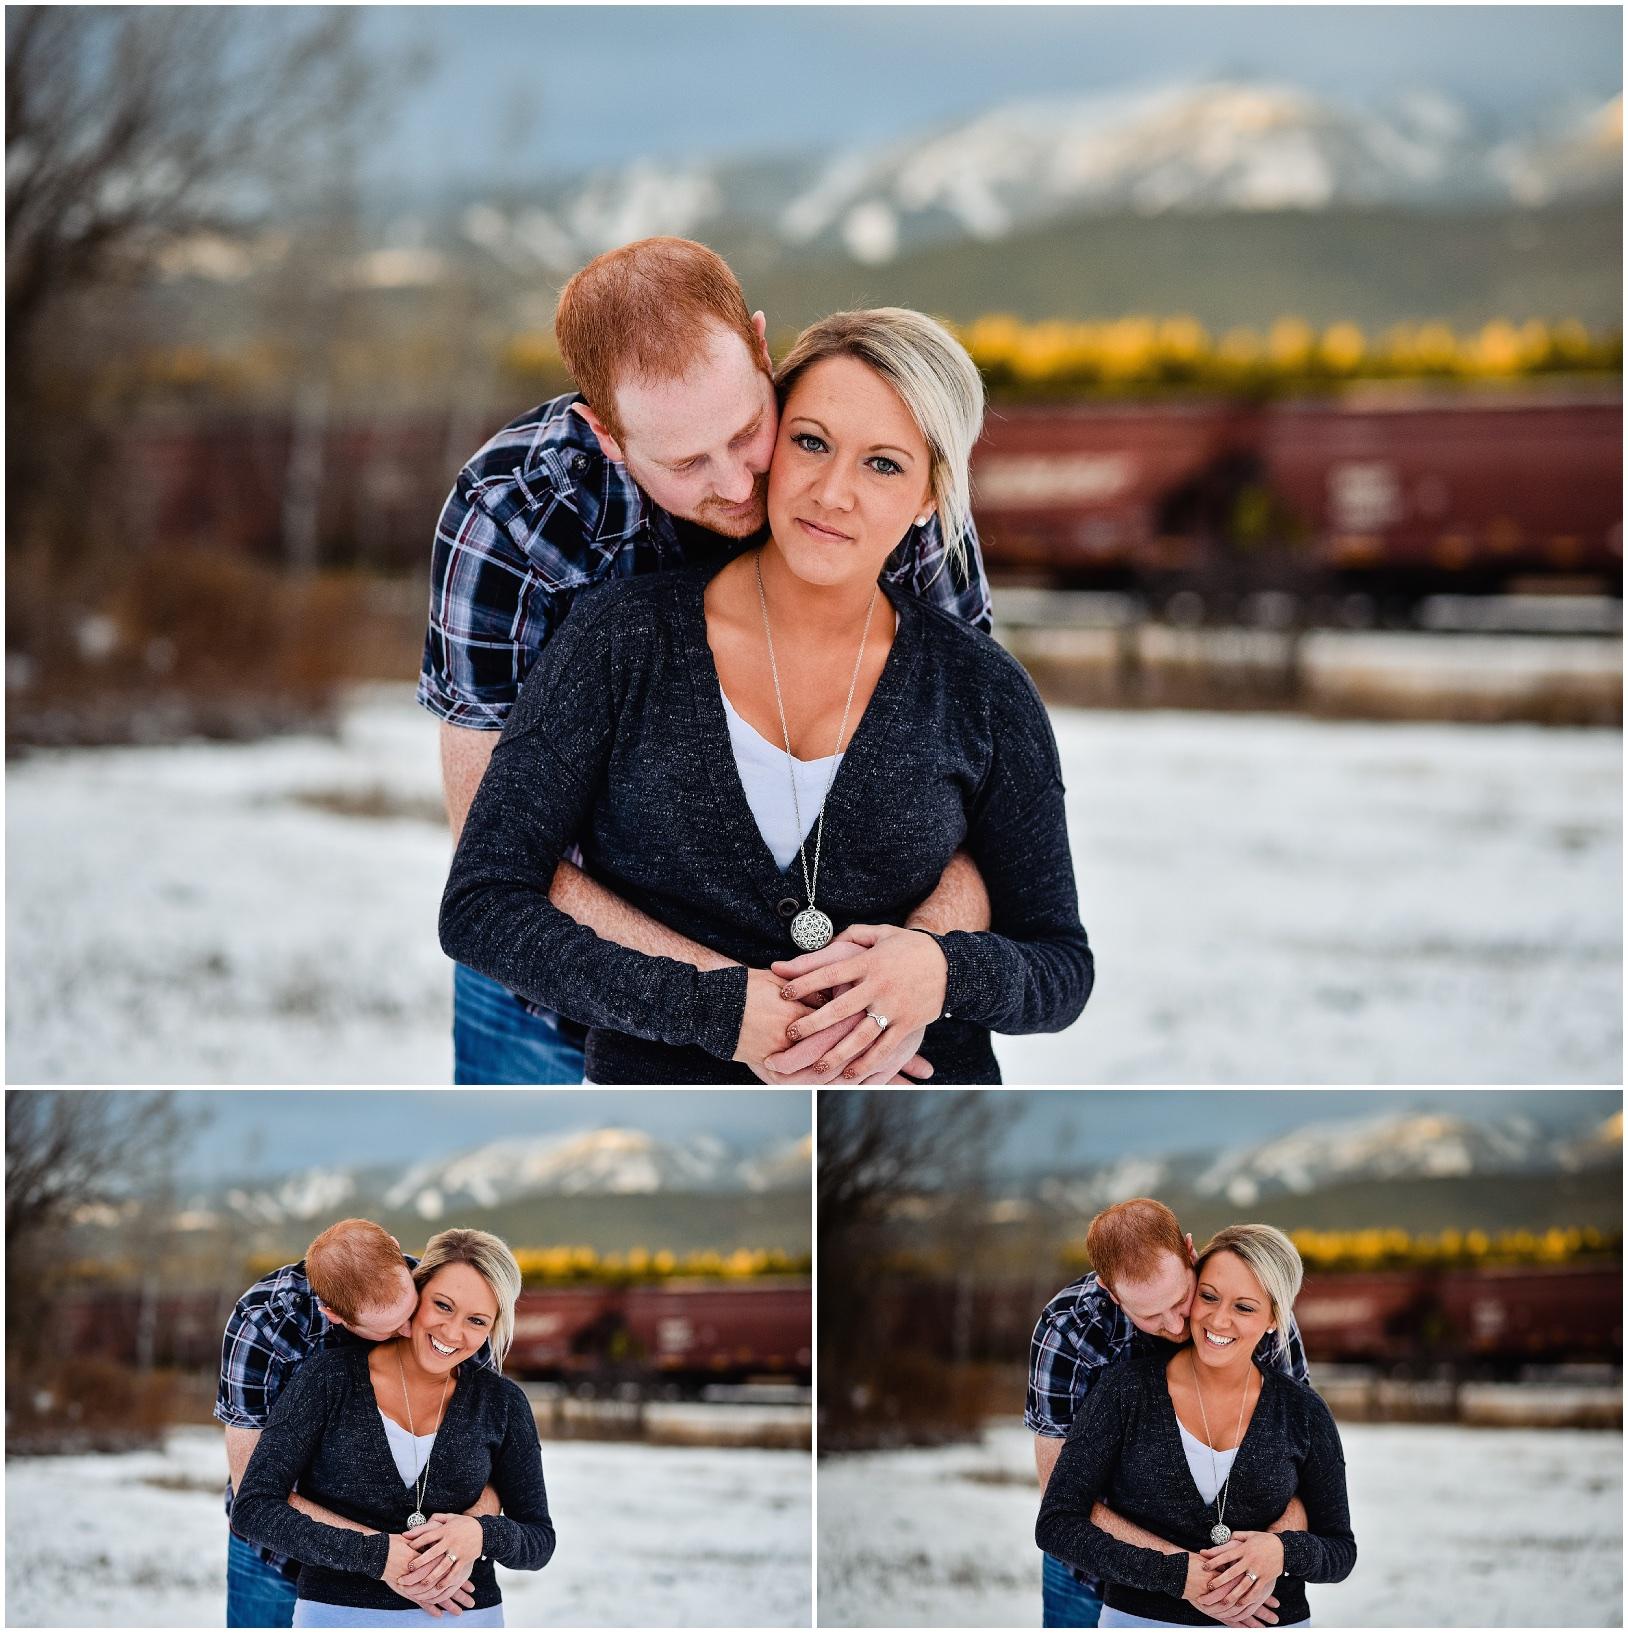 lindseyjanephotography_engagement004.jpg